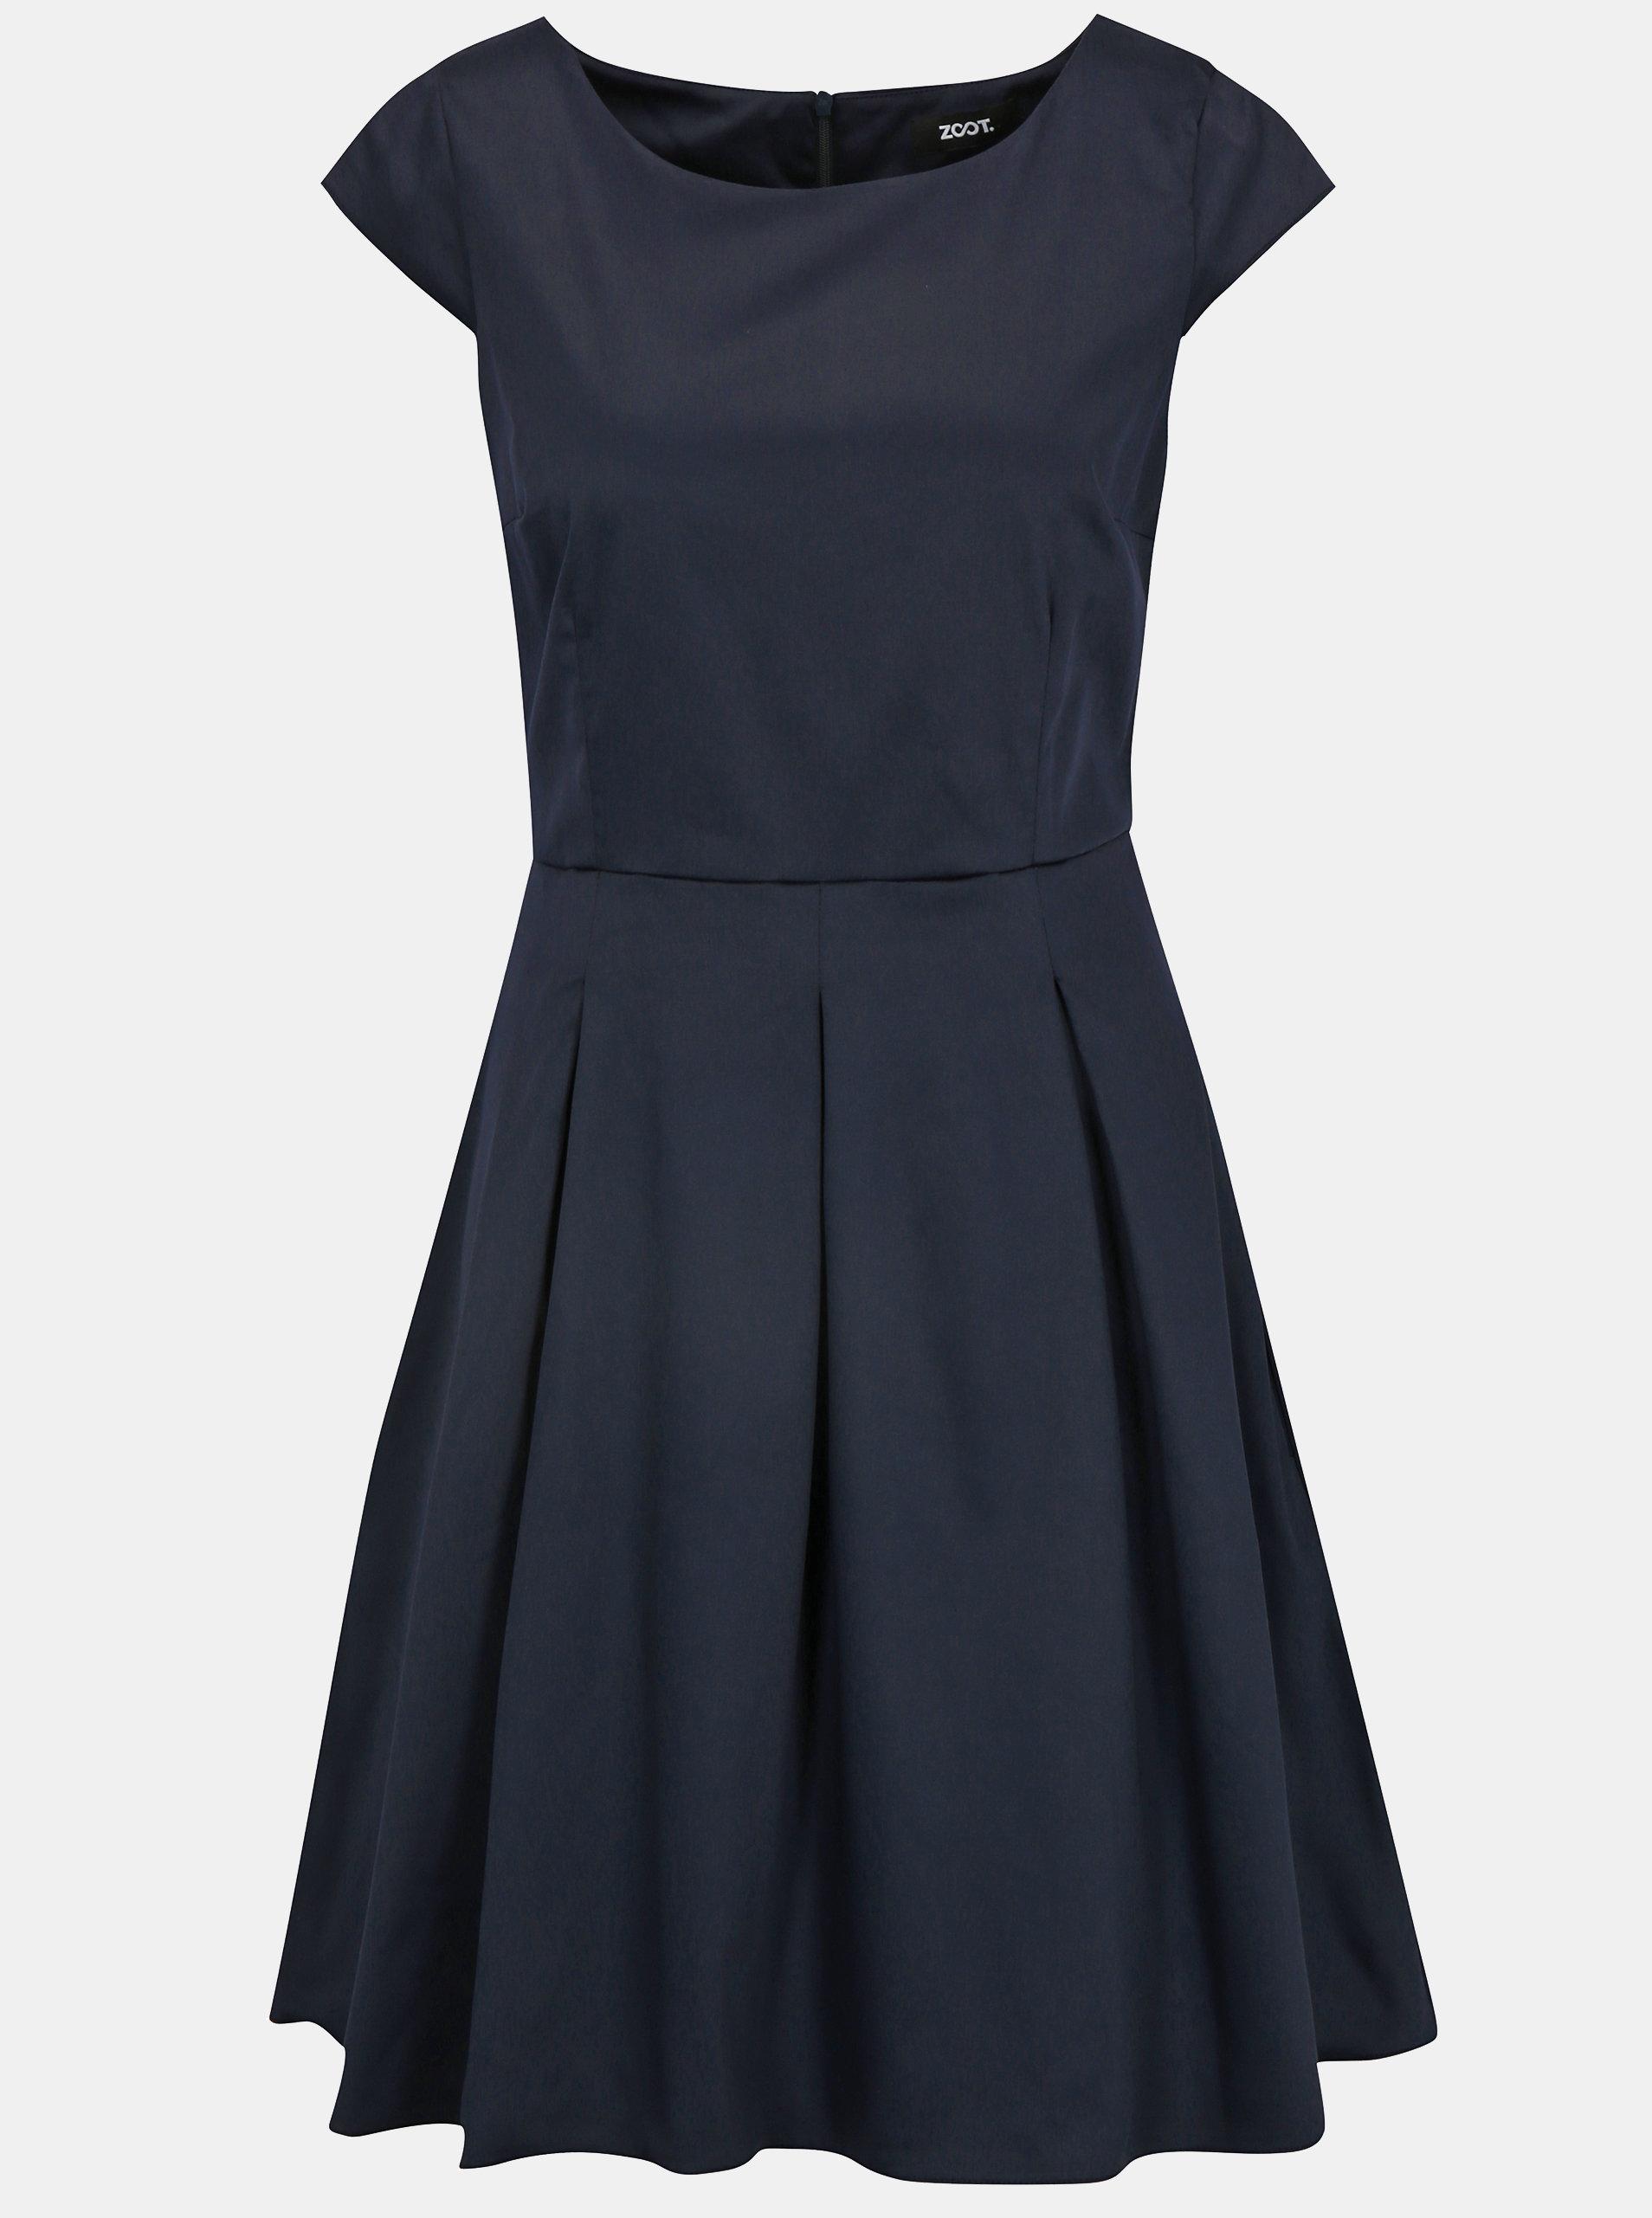 2ca52547c919 Tmavomodré šaty s áčkovou sukňou ZOOT ...